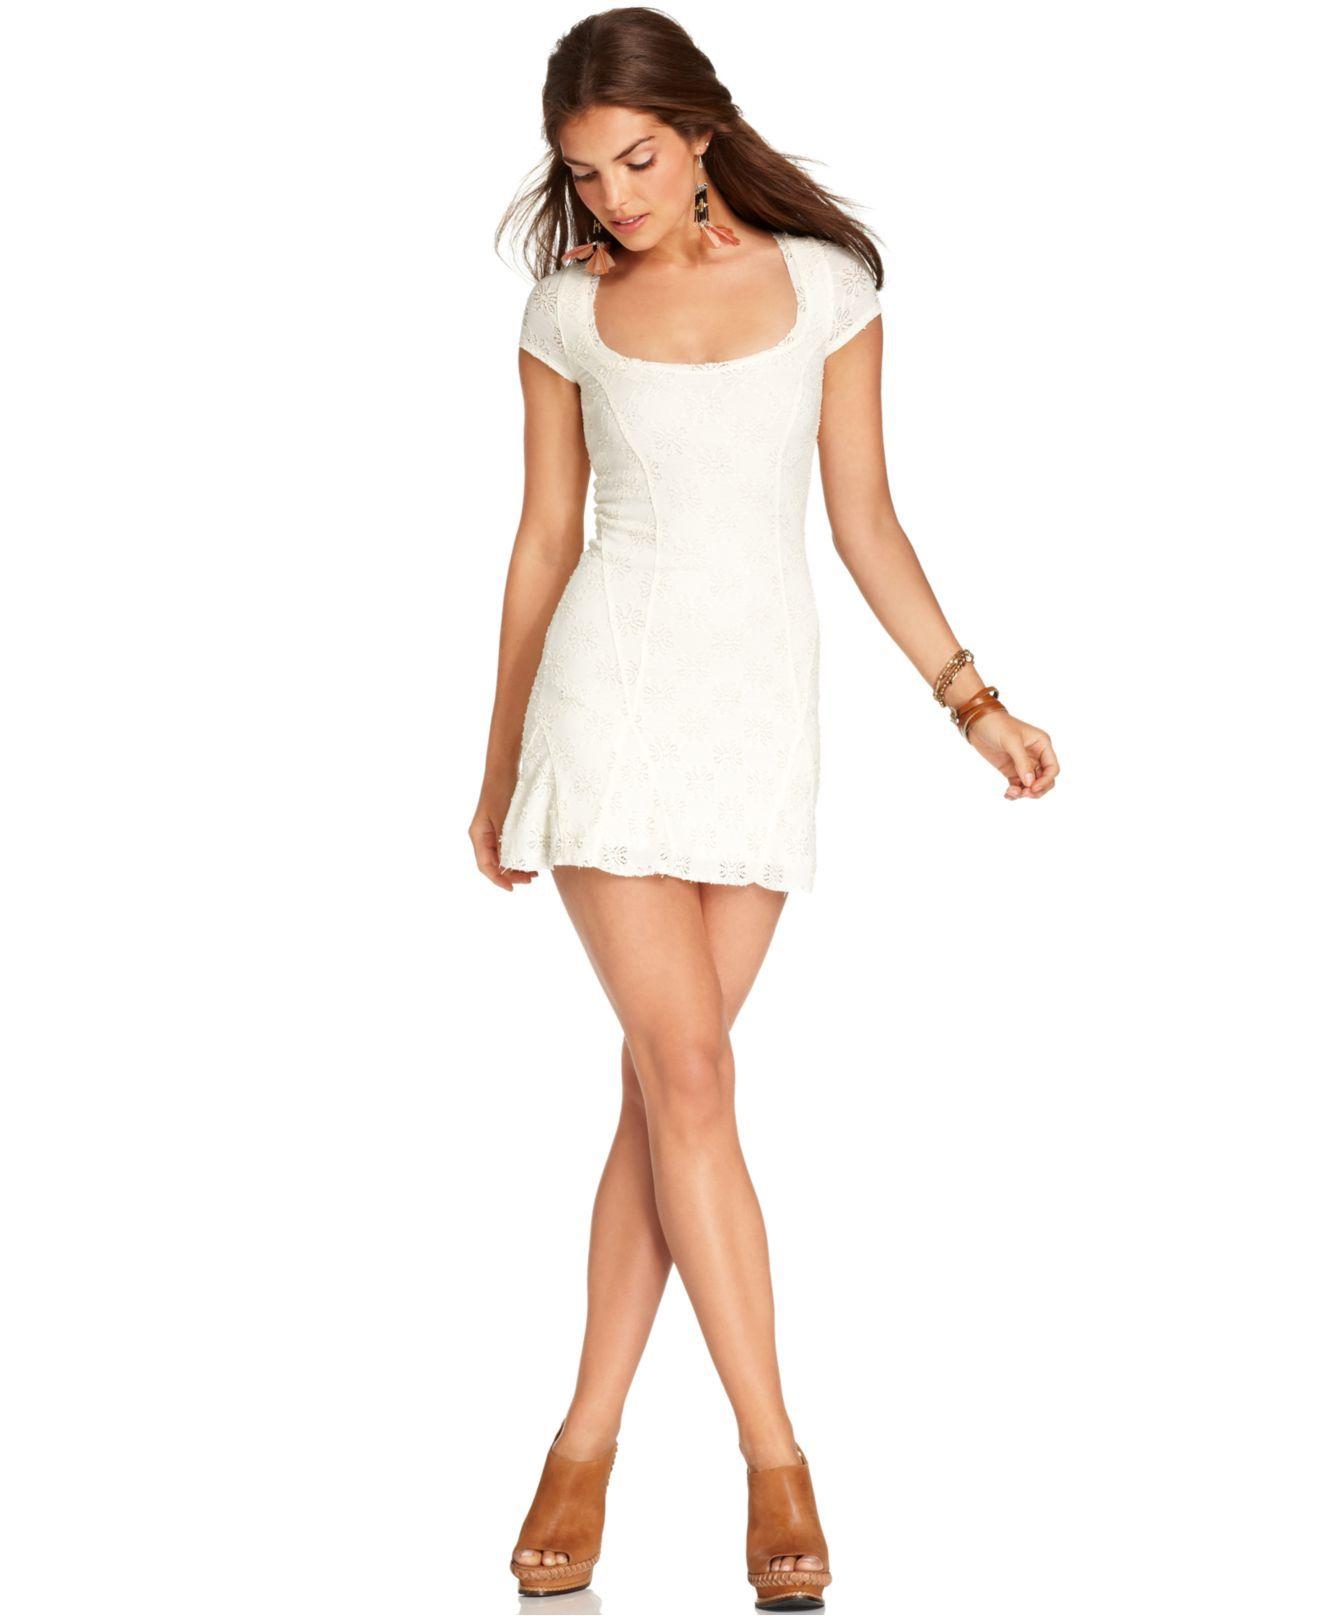 Macys womens dresses wedding  Free People Dress ShortSleeve ScoopNeck Lace ALine  Womens